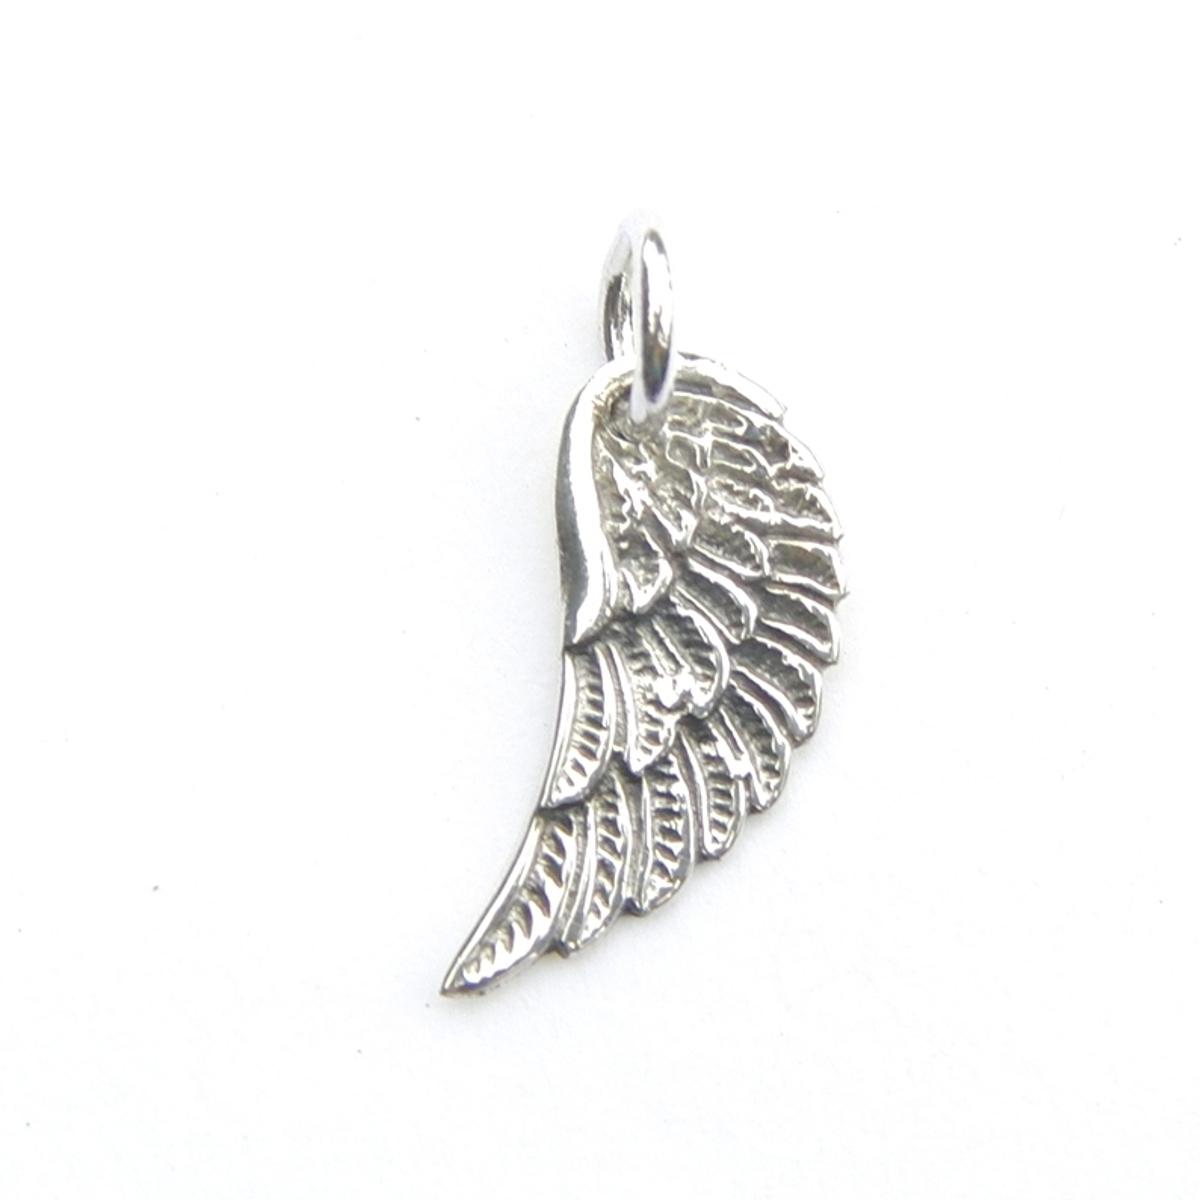 Dainty Angel Wing Charm / Pendant